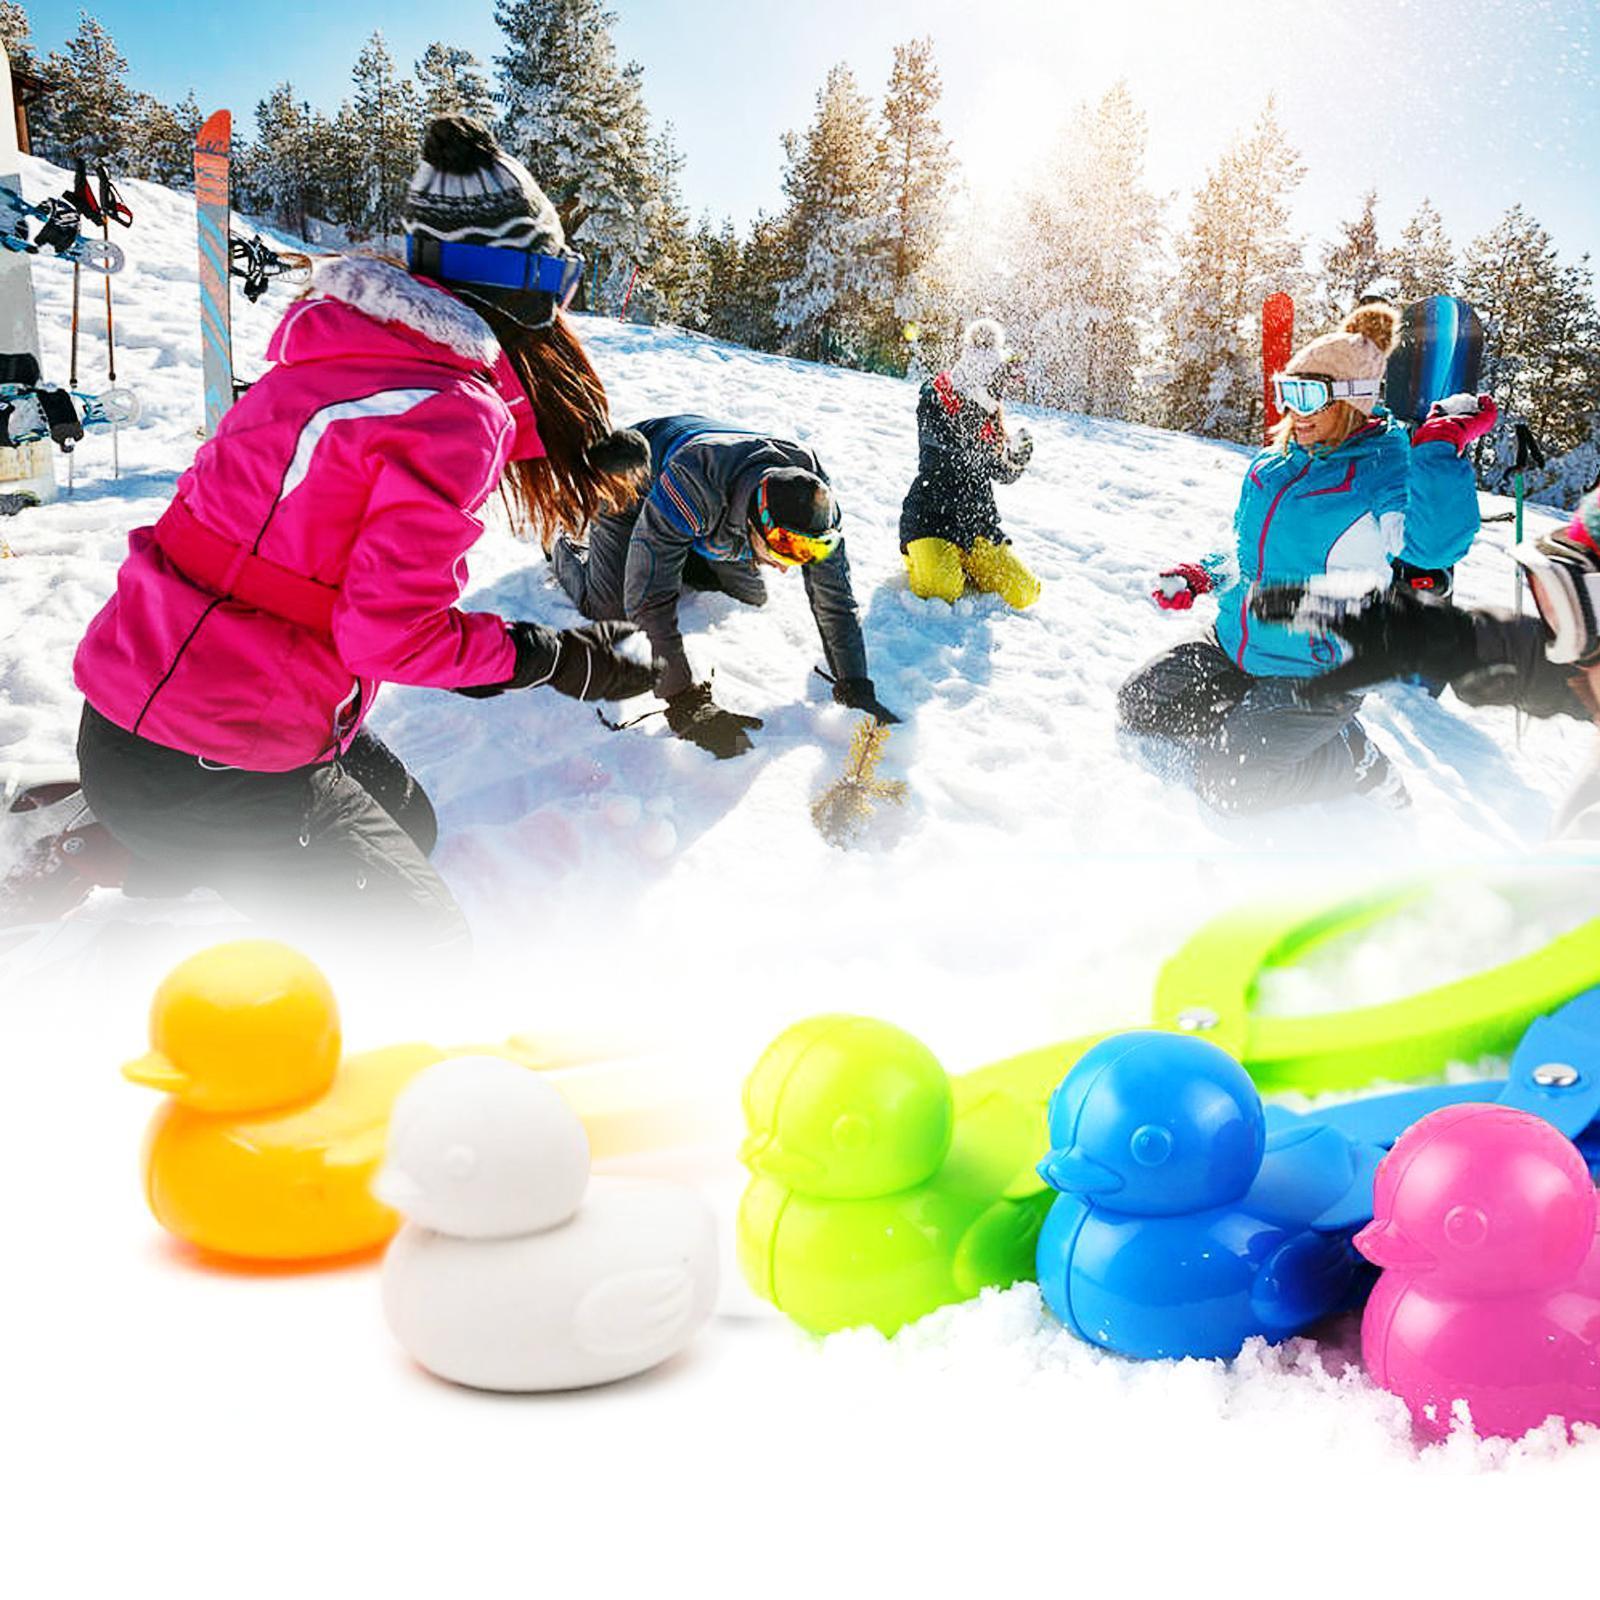 Onceal Katzenform Schneeball Maker Schneeballzange,Kinder Schneeball Maker Schneeball Form Clip Tool Spielzeug f/ür Winter Outdoor-Sportarten